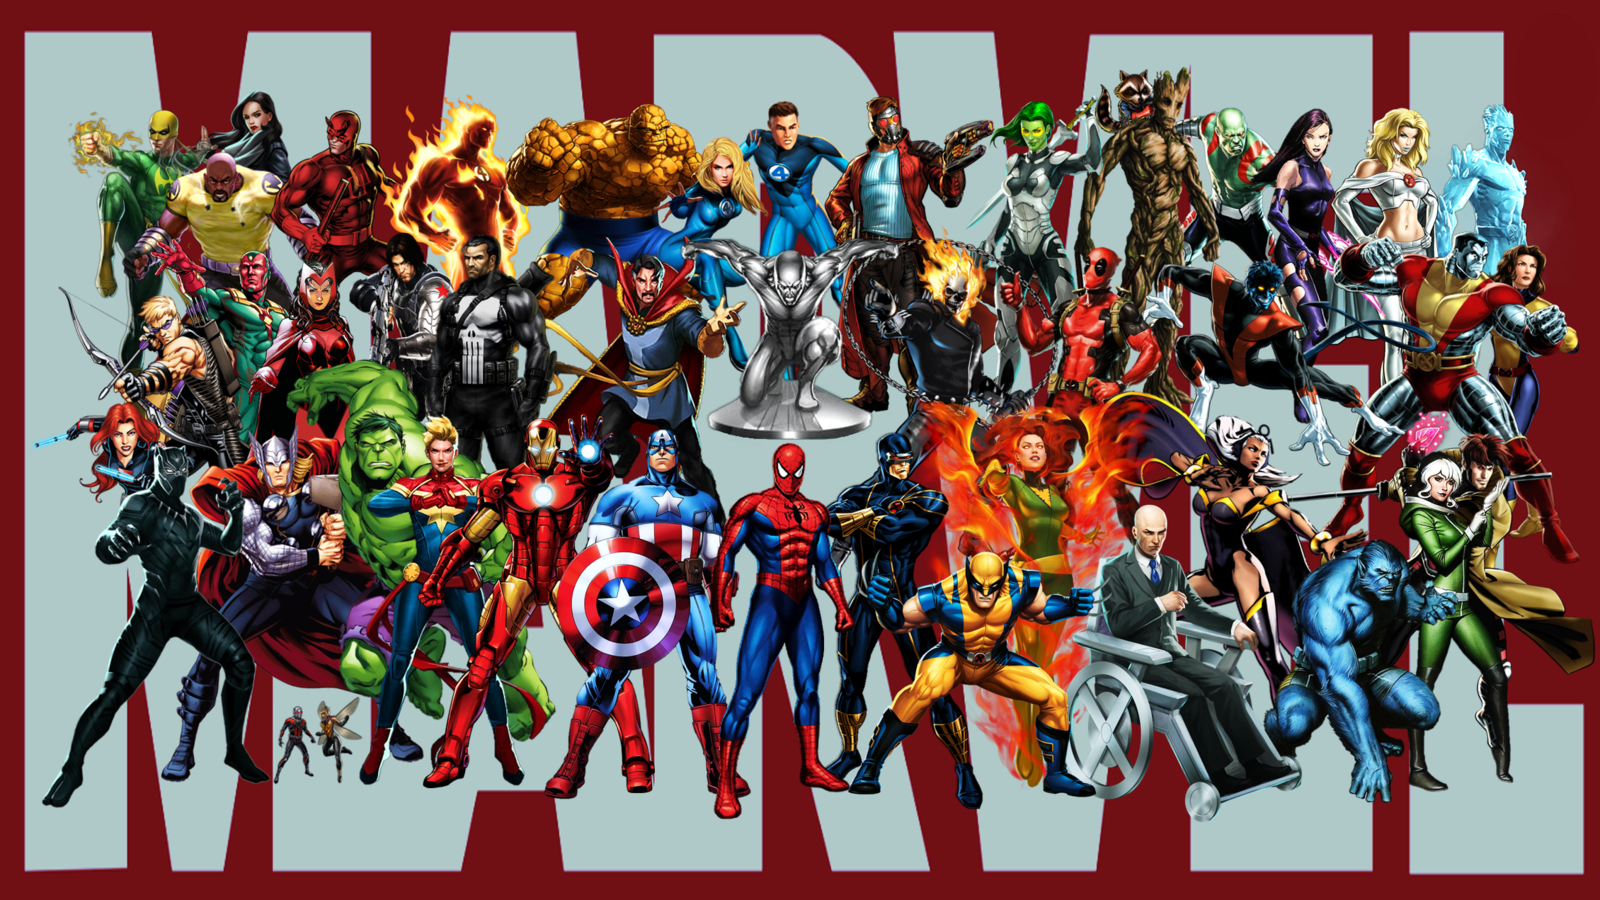 Marvel super heroes wallpaper by stingertheoverlord on - All marvel heroes wallpaper ...